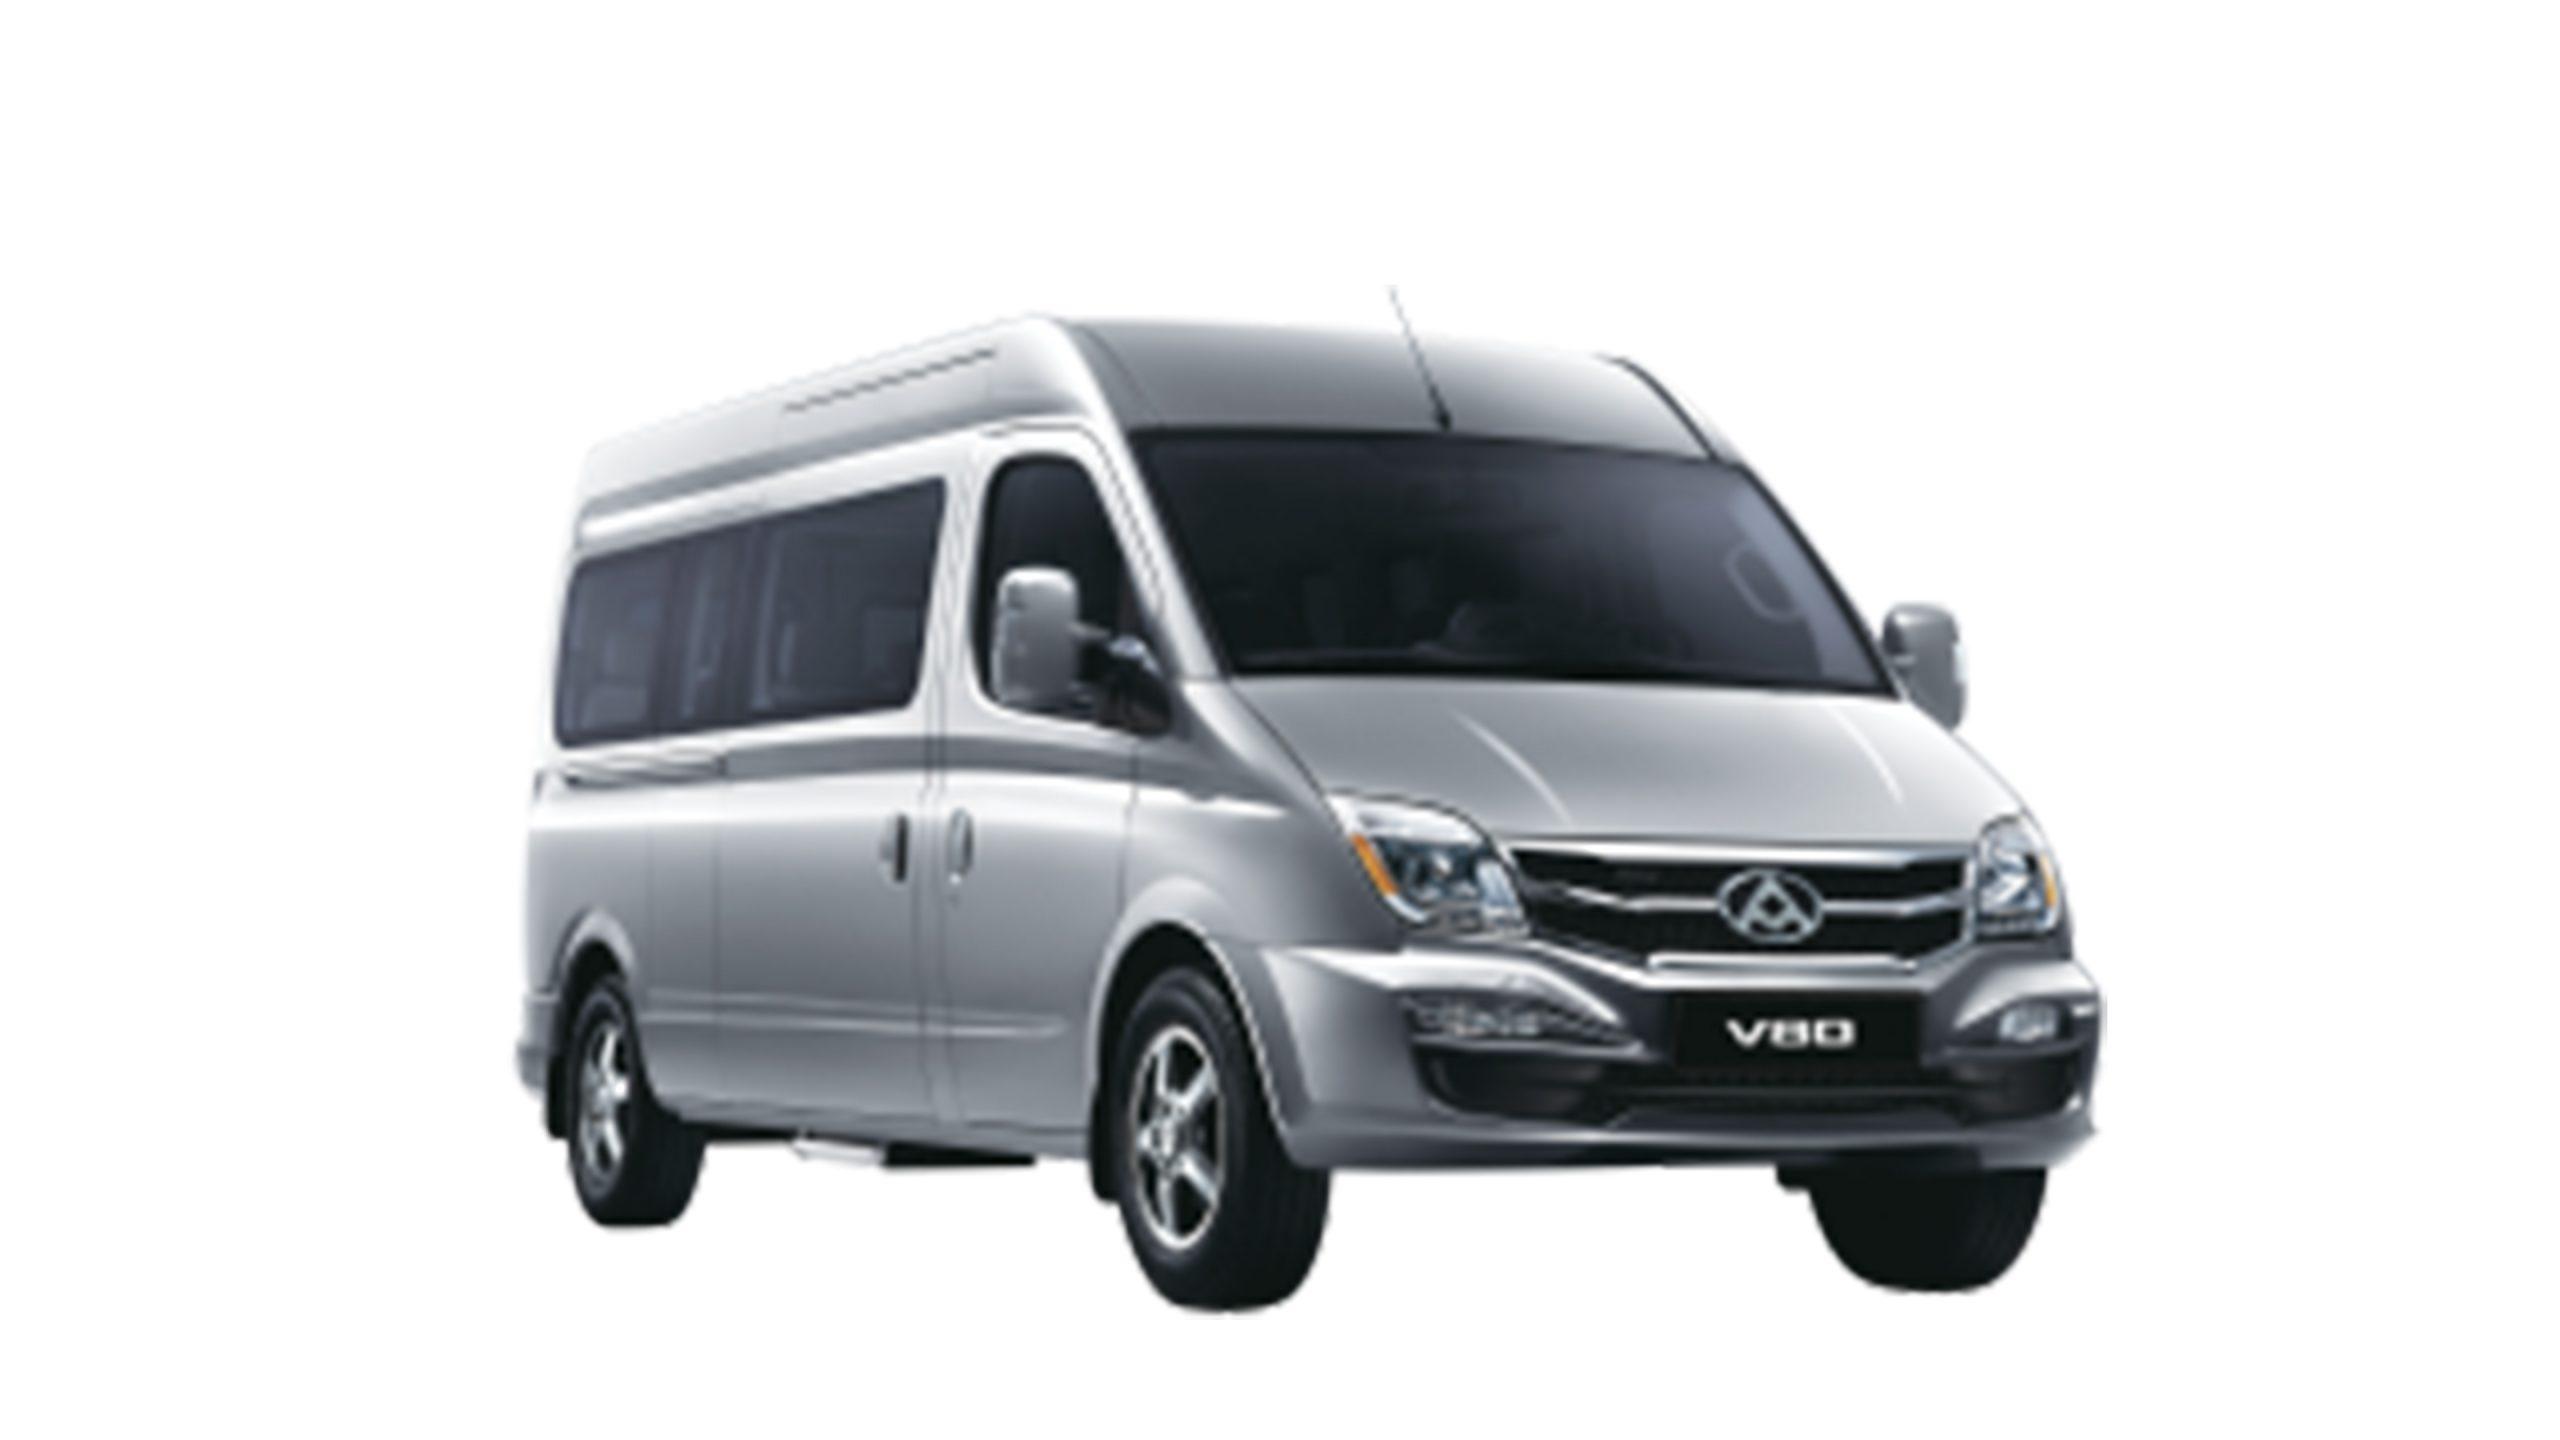 v80-12-seater-minibus